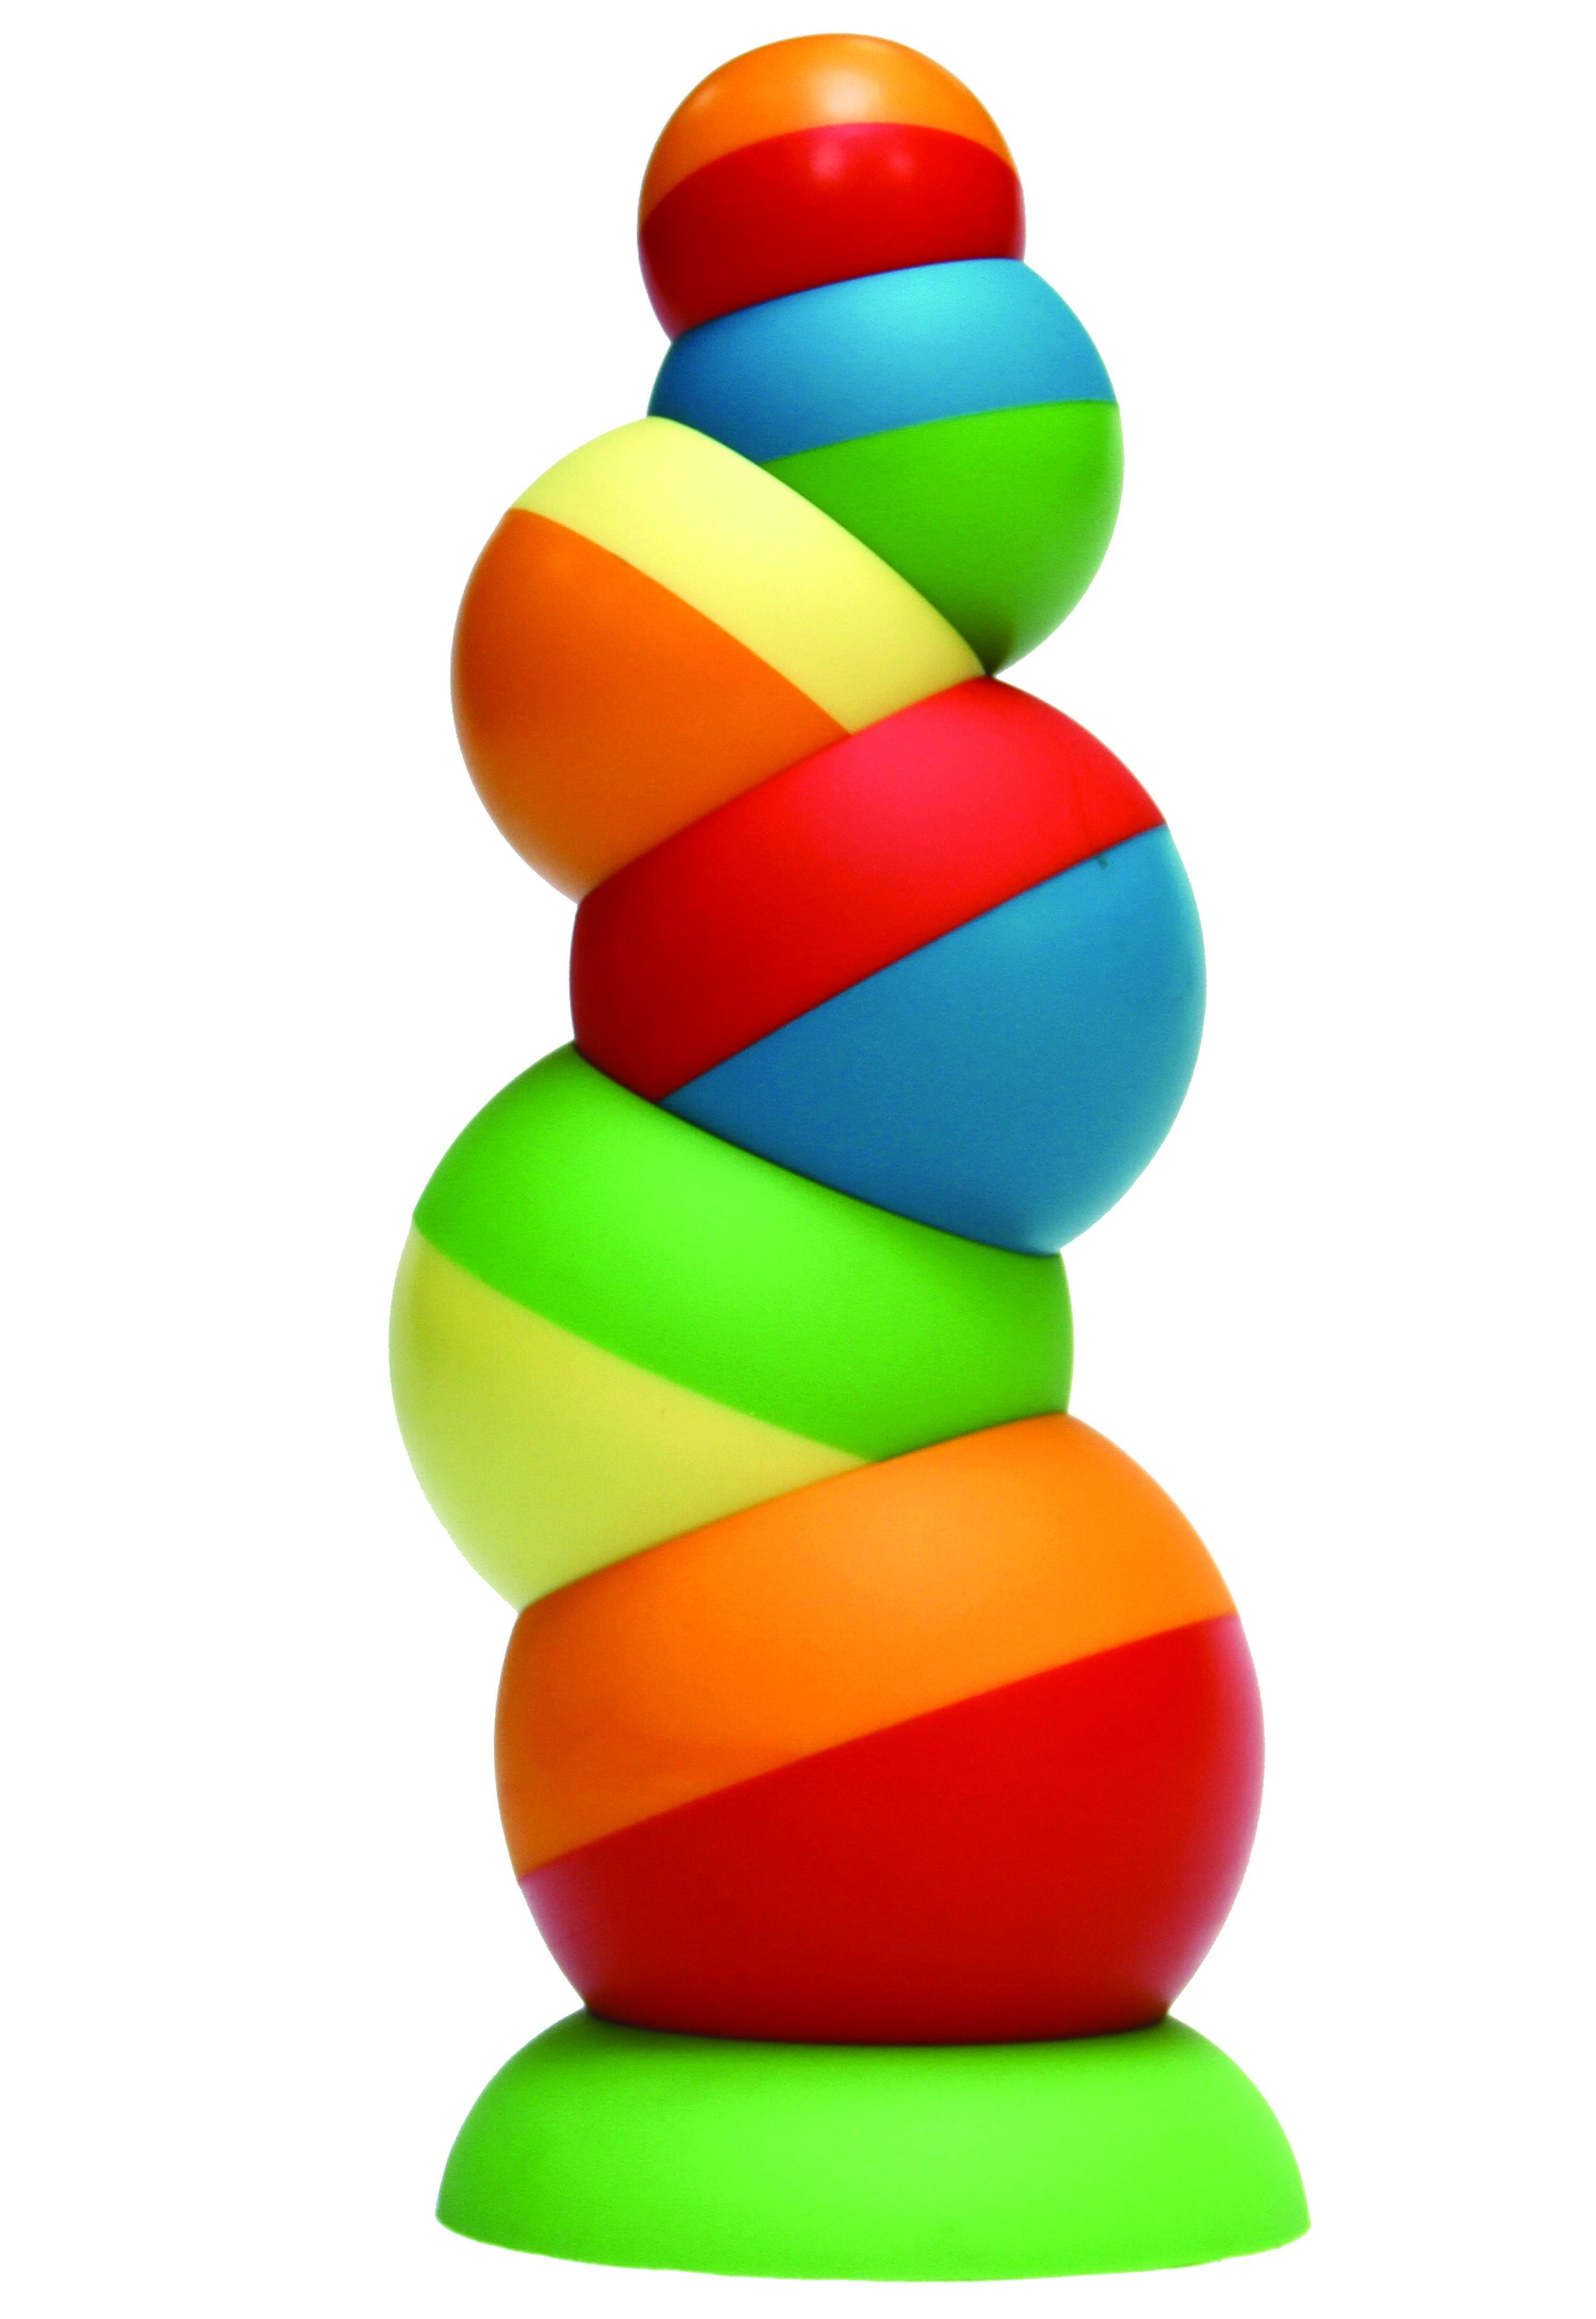 Joc de echilibru Tobbles - Fat Brain Toys 0